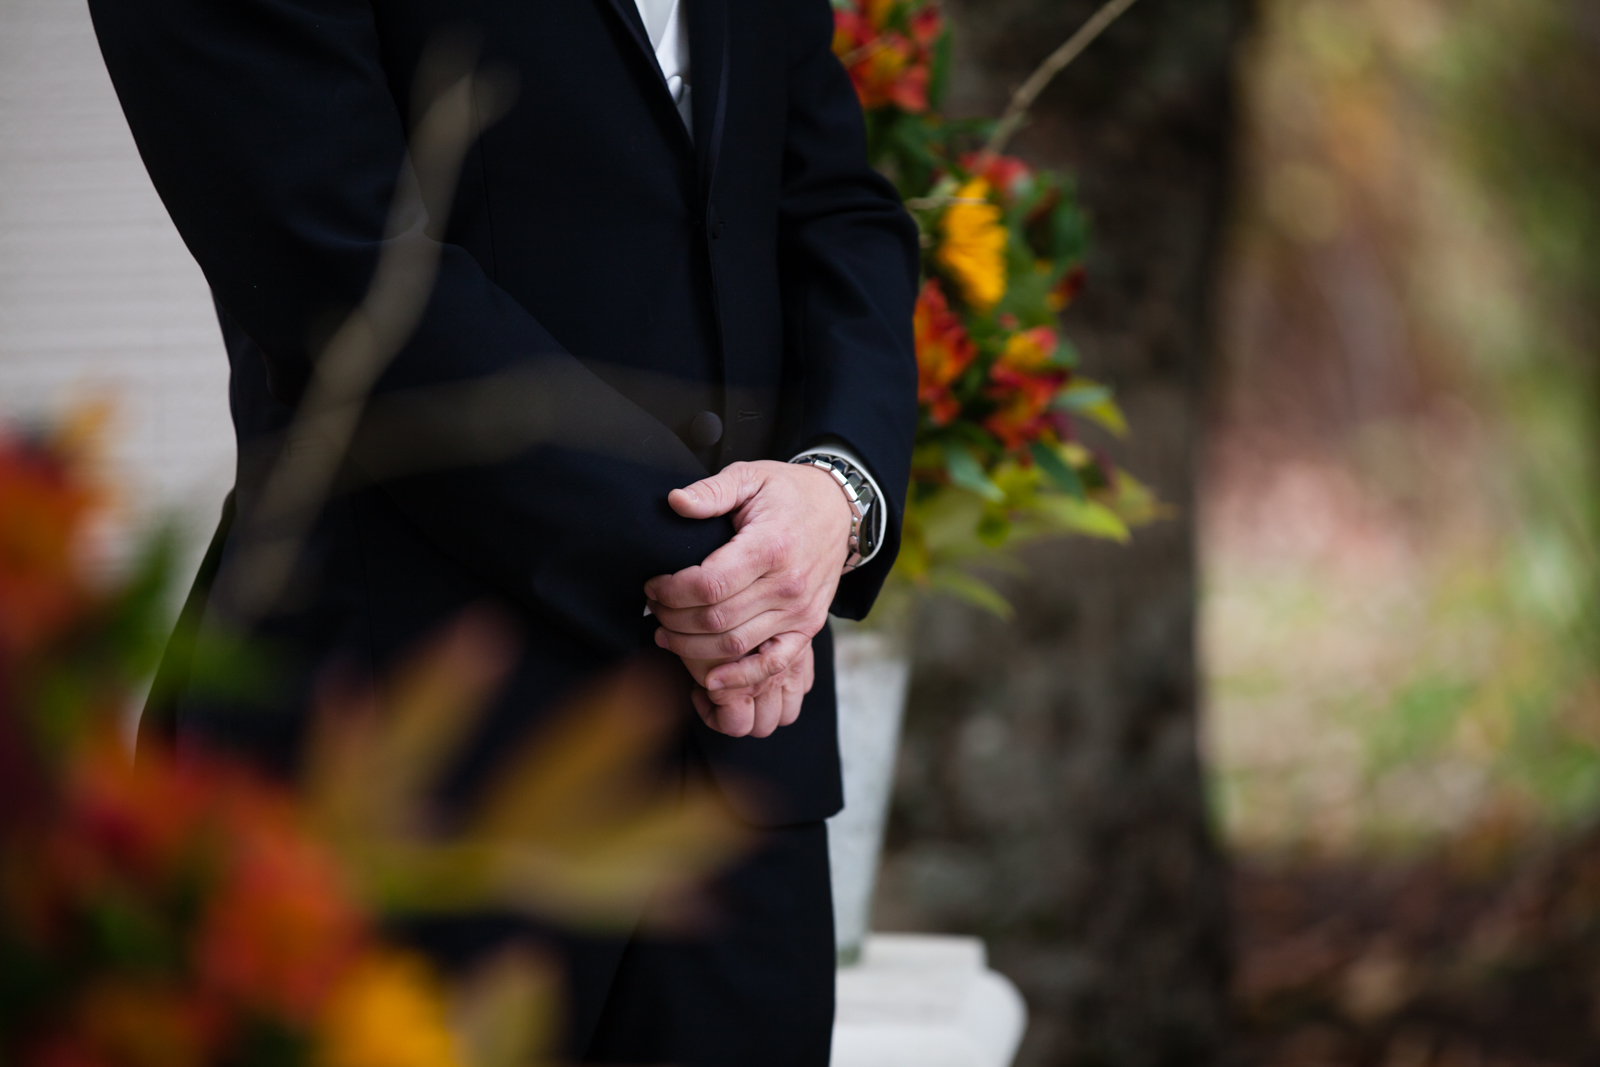 Glimmerstone-Mansion-Vermont-Wedding-Photography-Amanda-Morgan-46.jpg